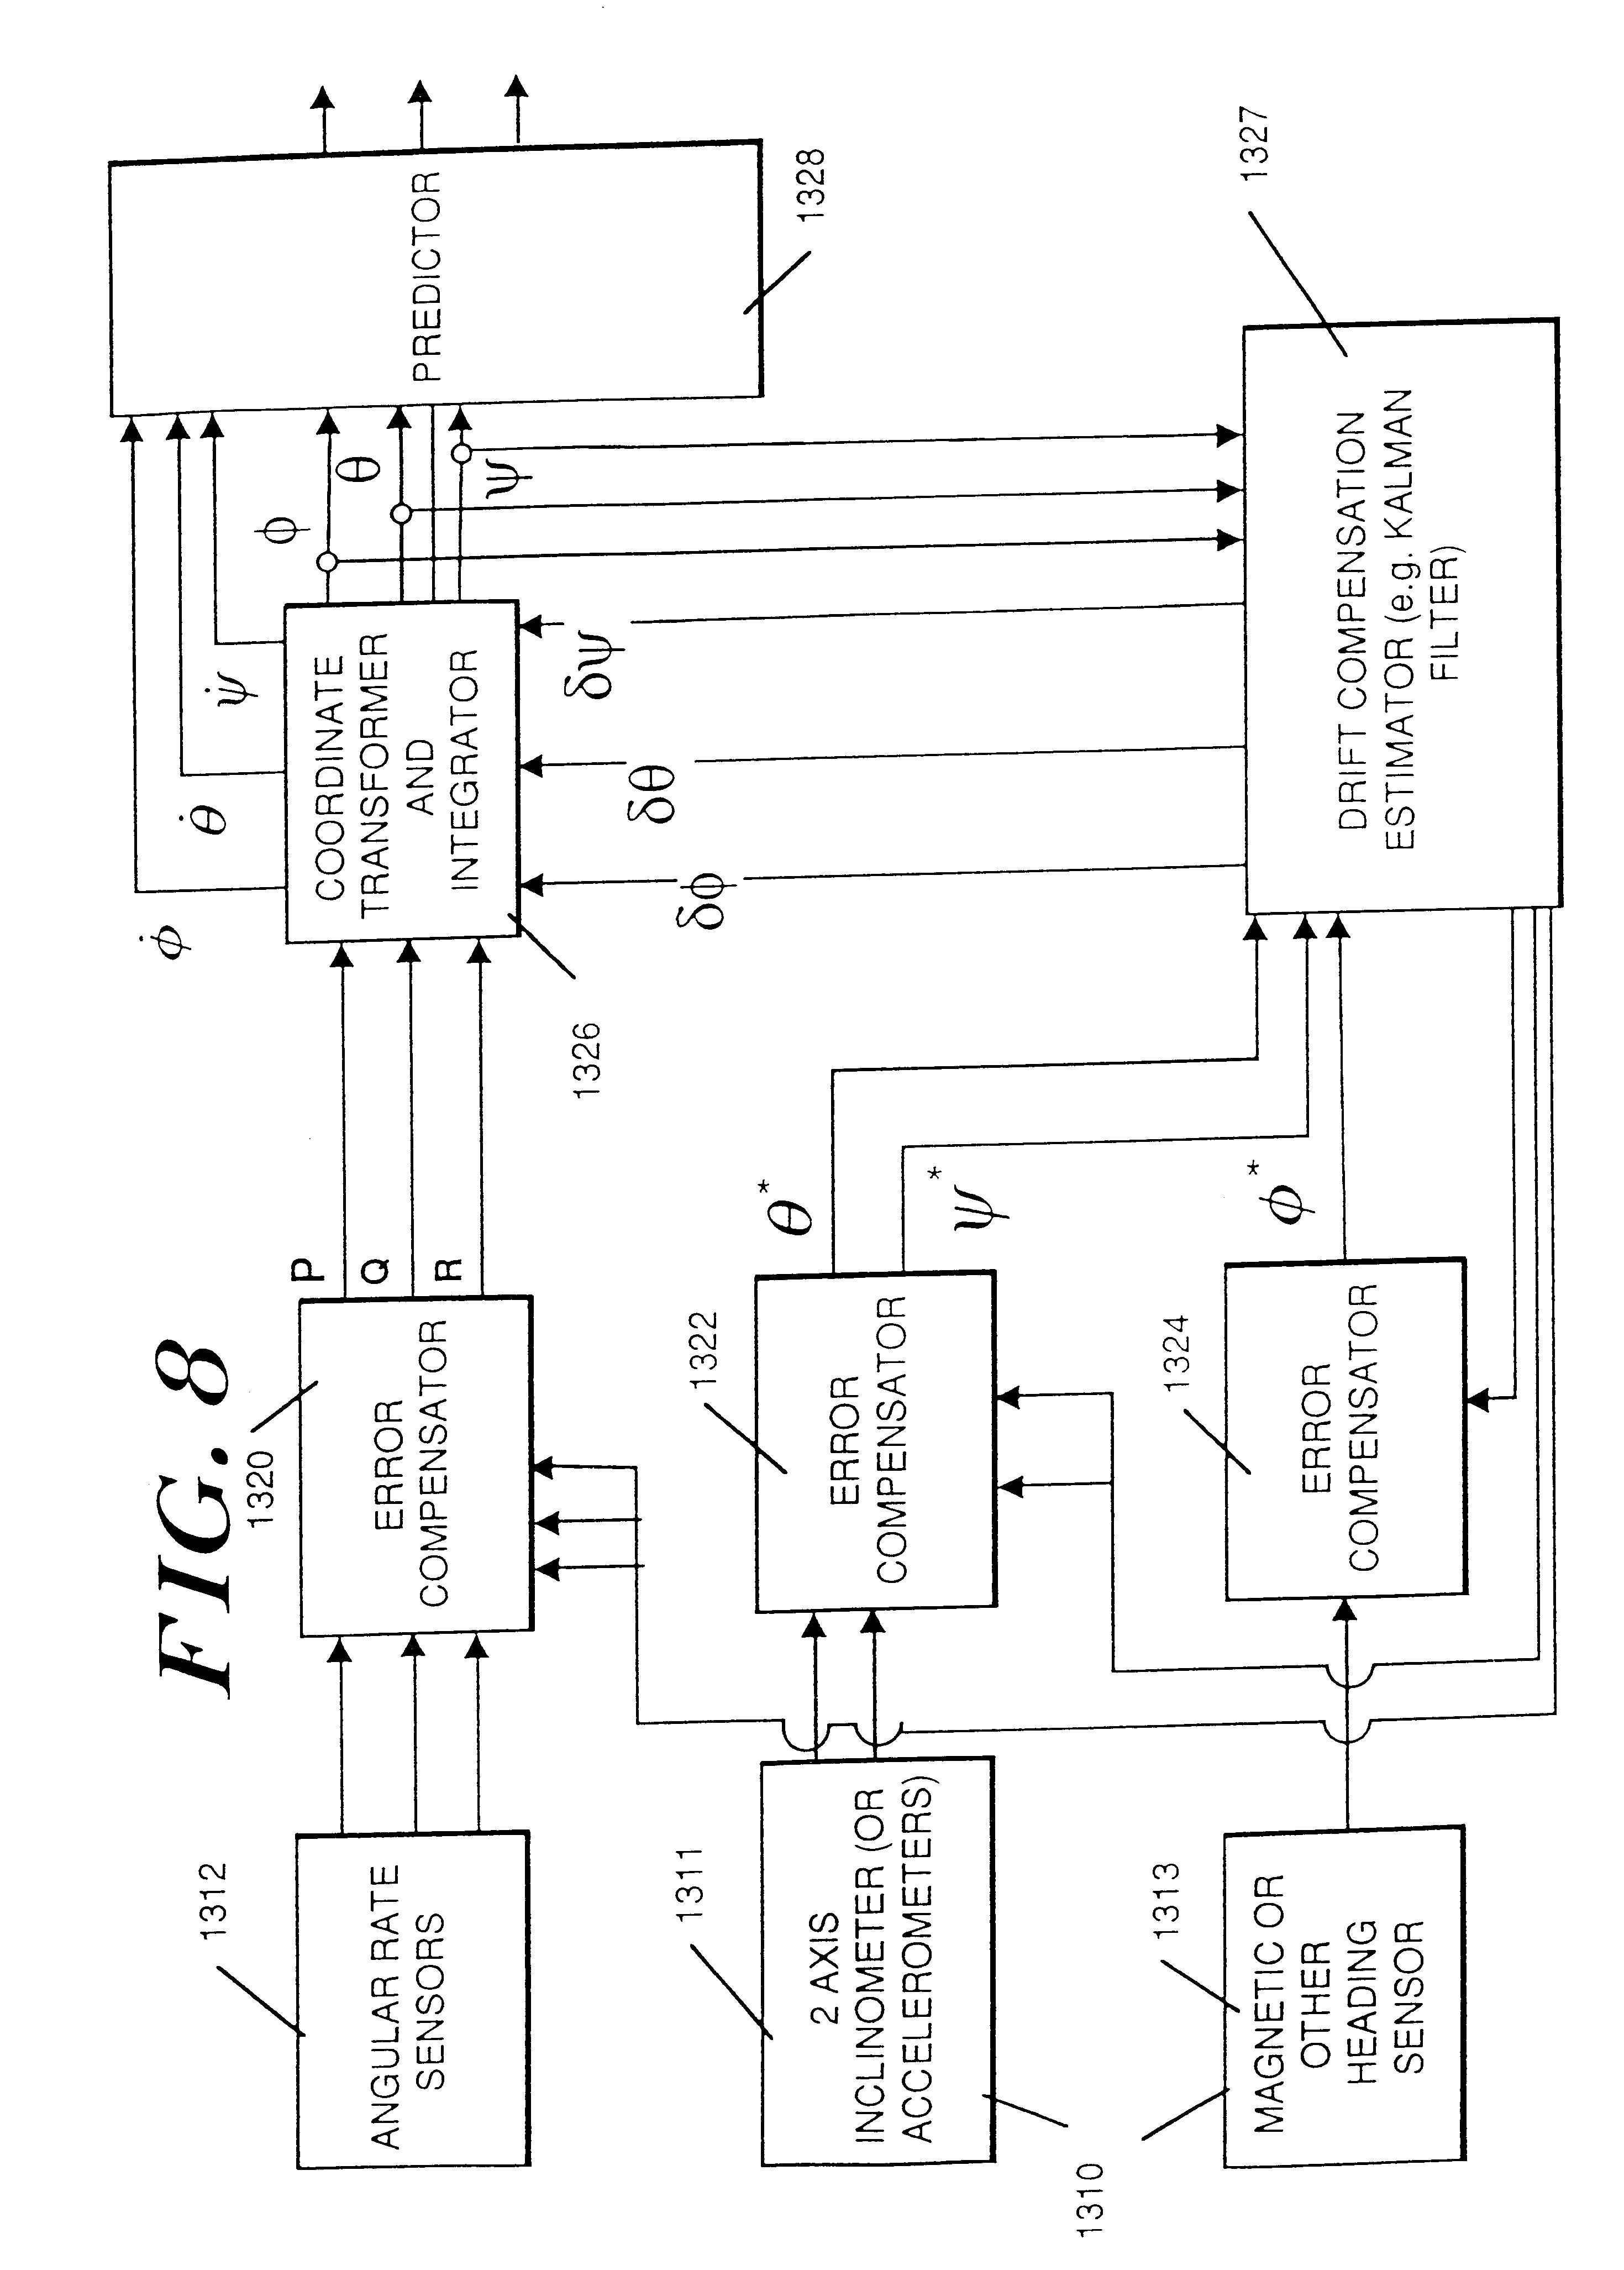 Patent US 6,786,877 B2